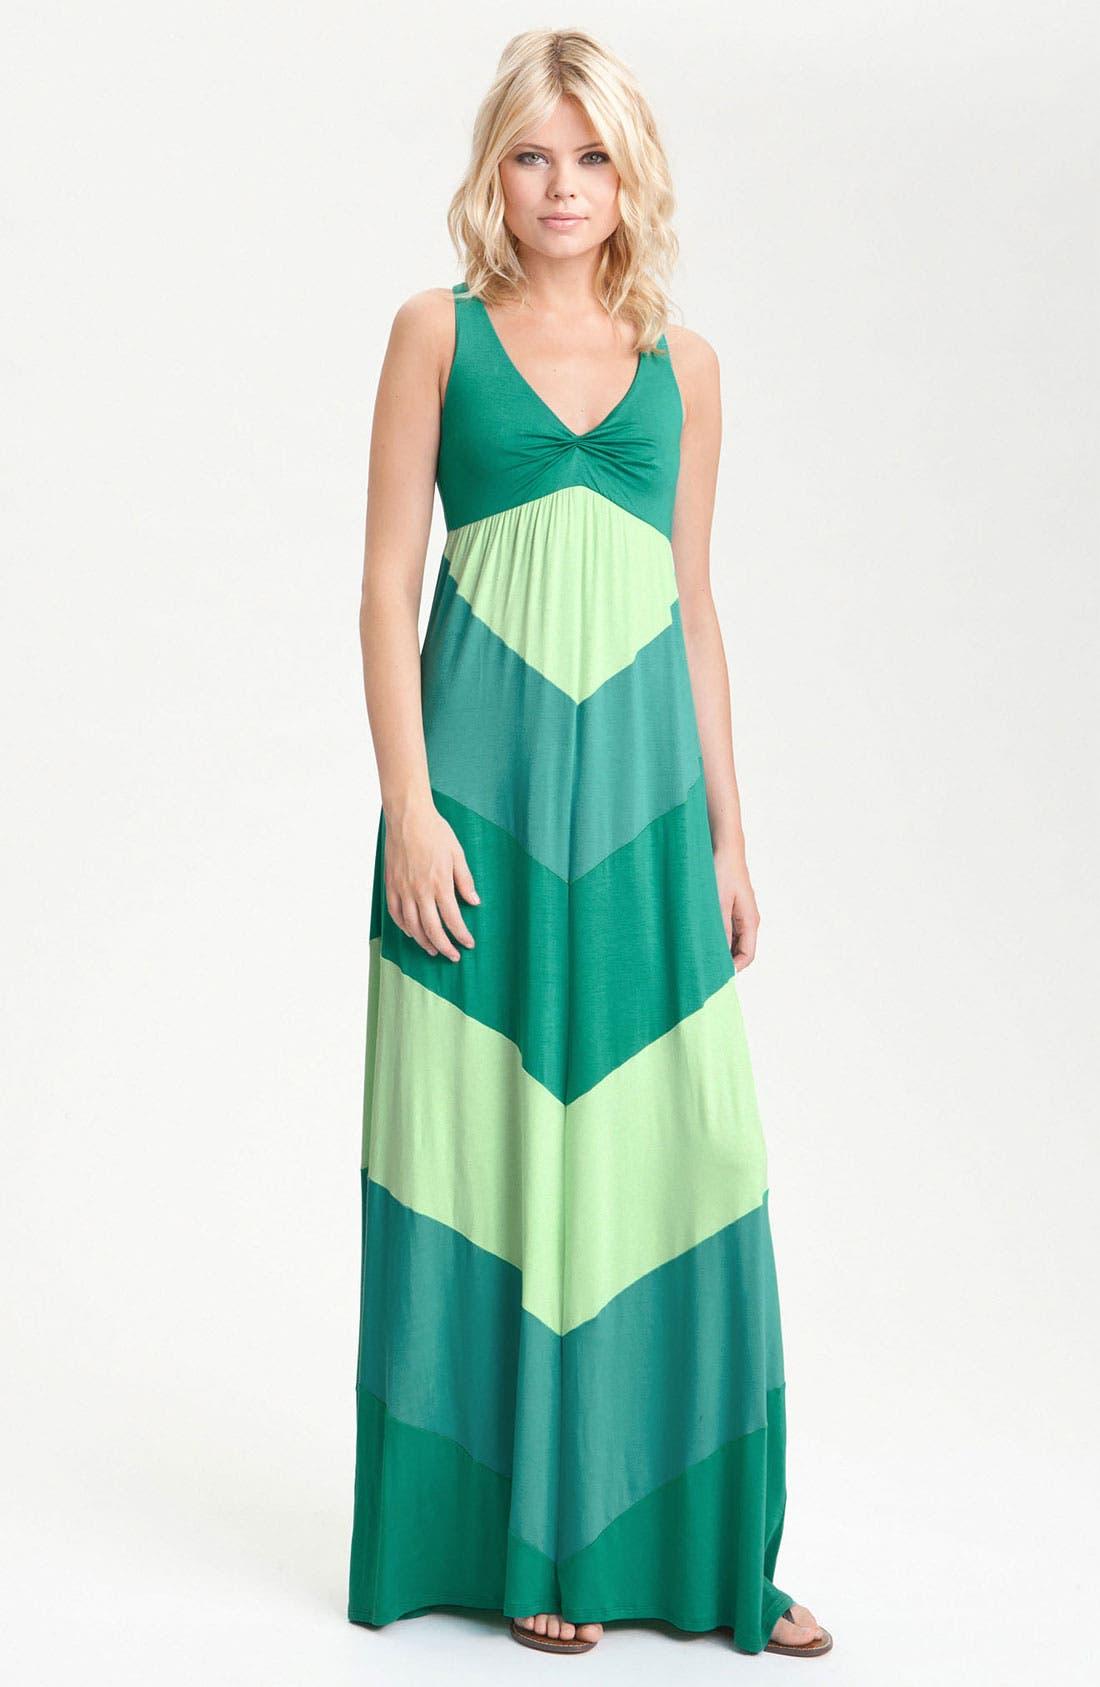 Main Image - Ella Moss 'Celia' Racerback Colorblock Maxi Dress